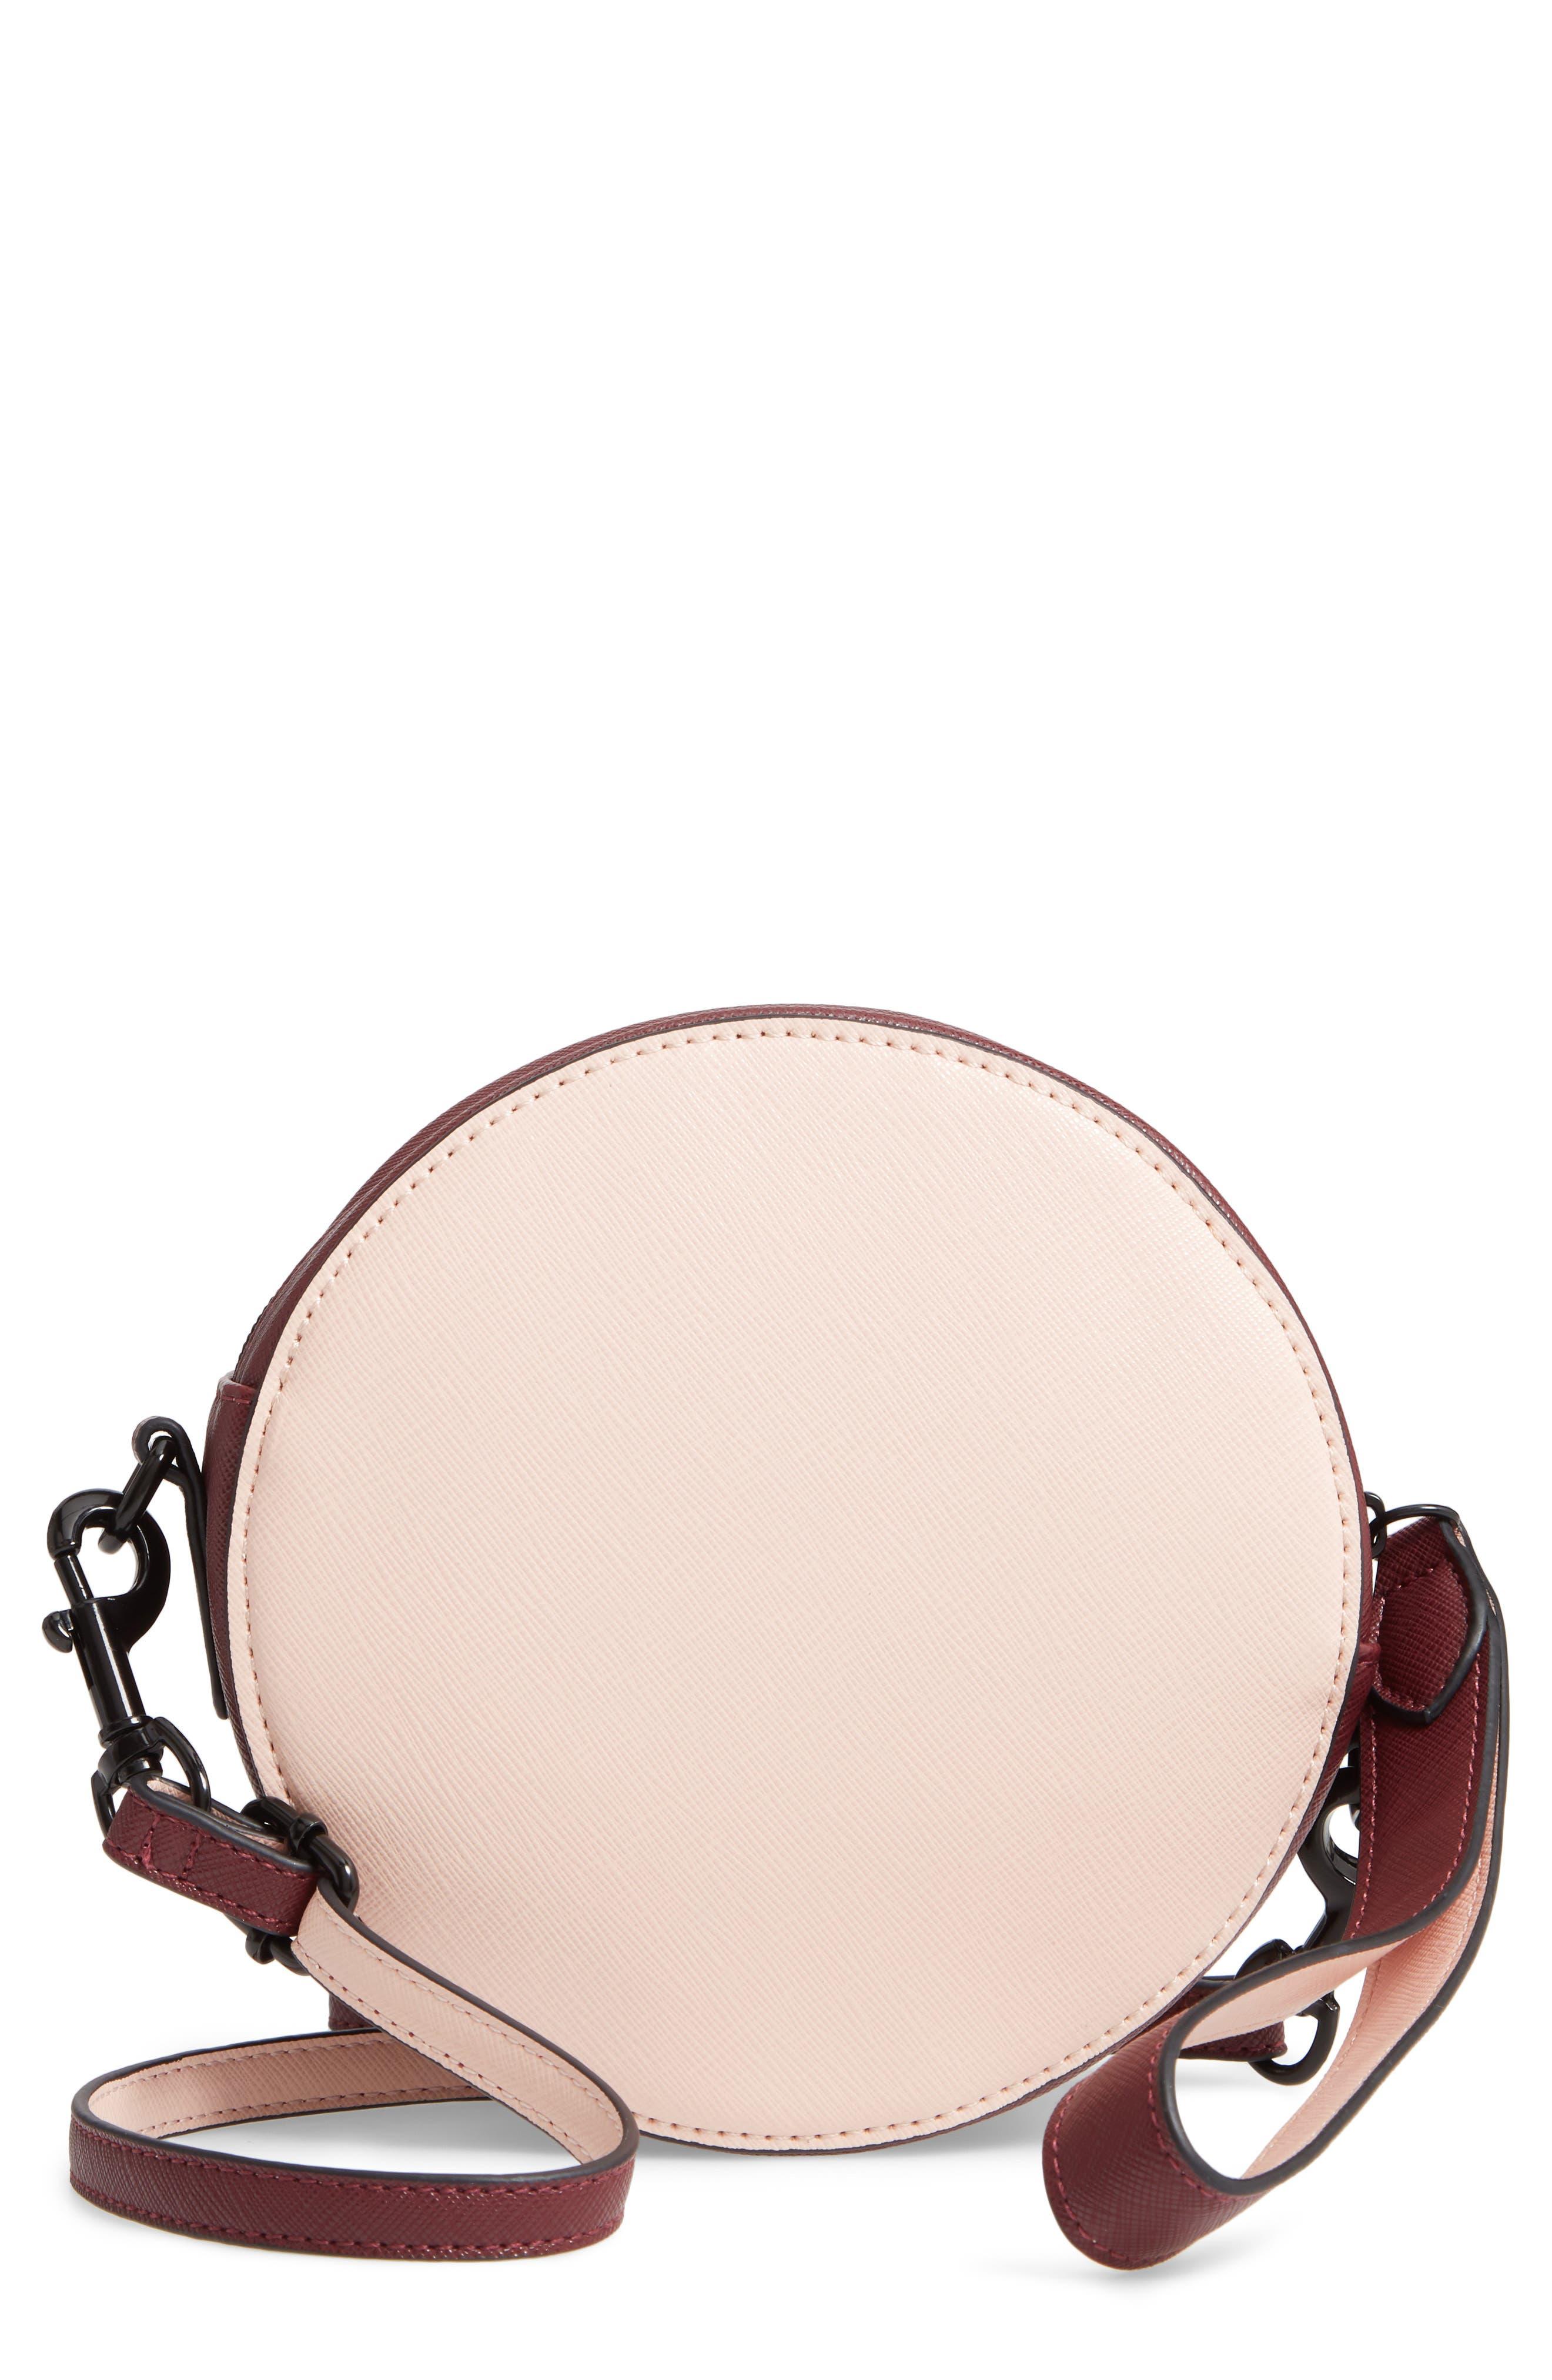 T-SHIRT & JEANS, Faux Leather Colorblock Canteen Crossbody Bag, Main thumbnail 1, color, 650